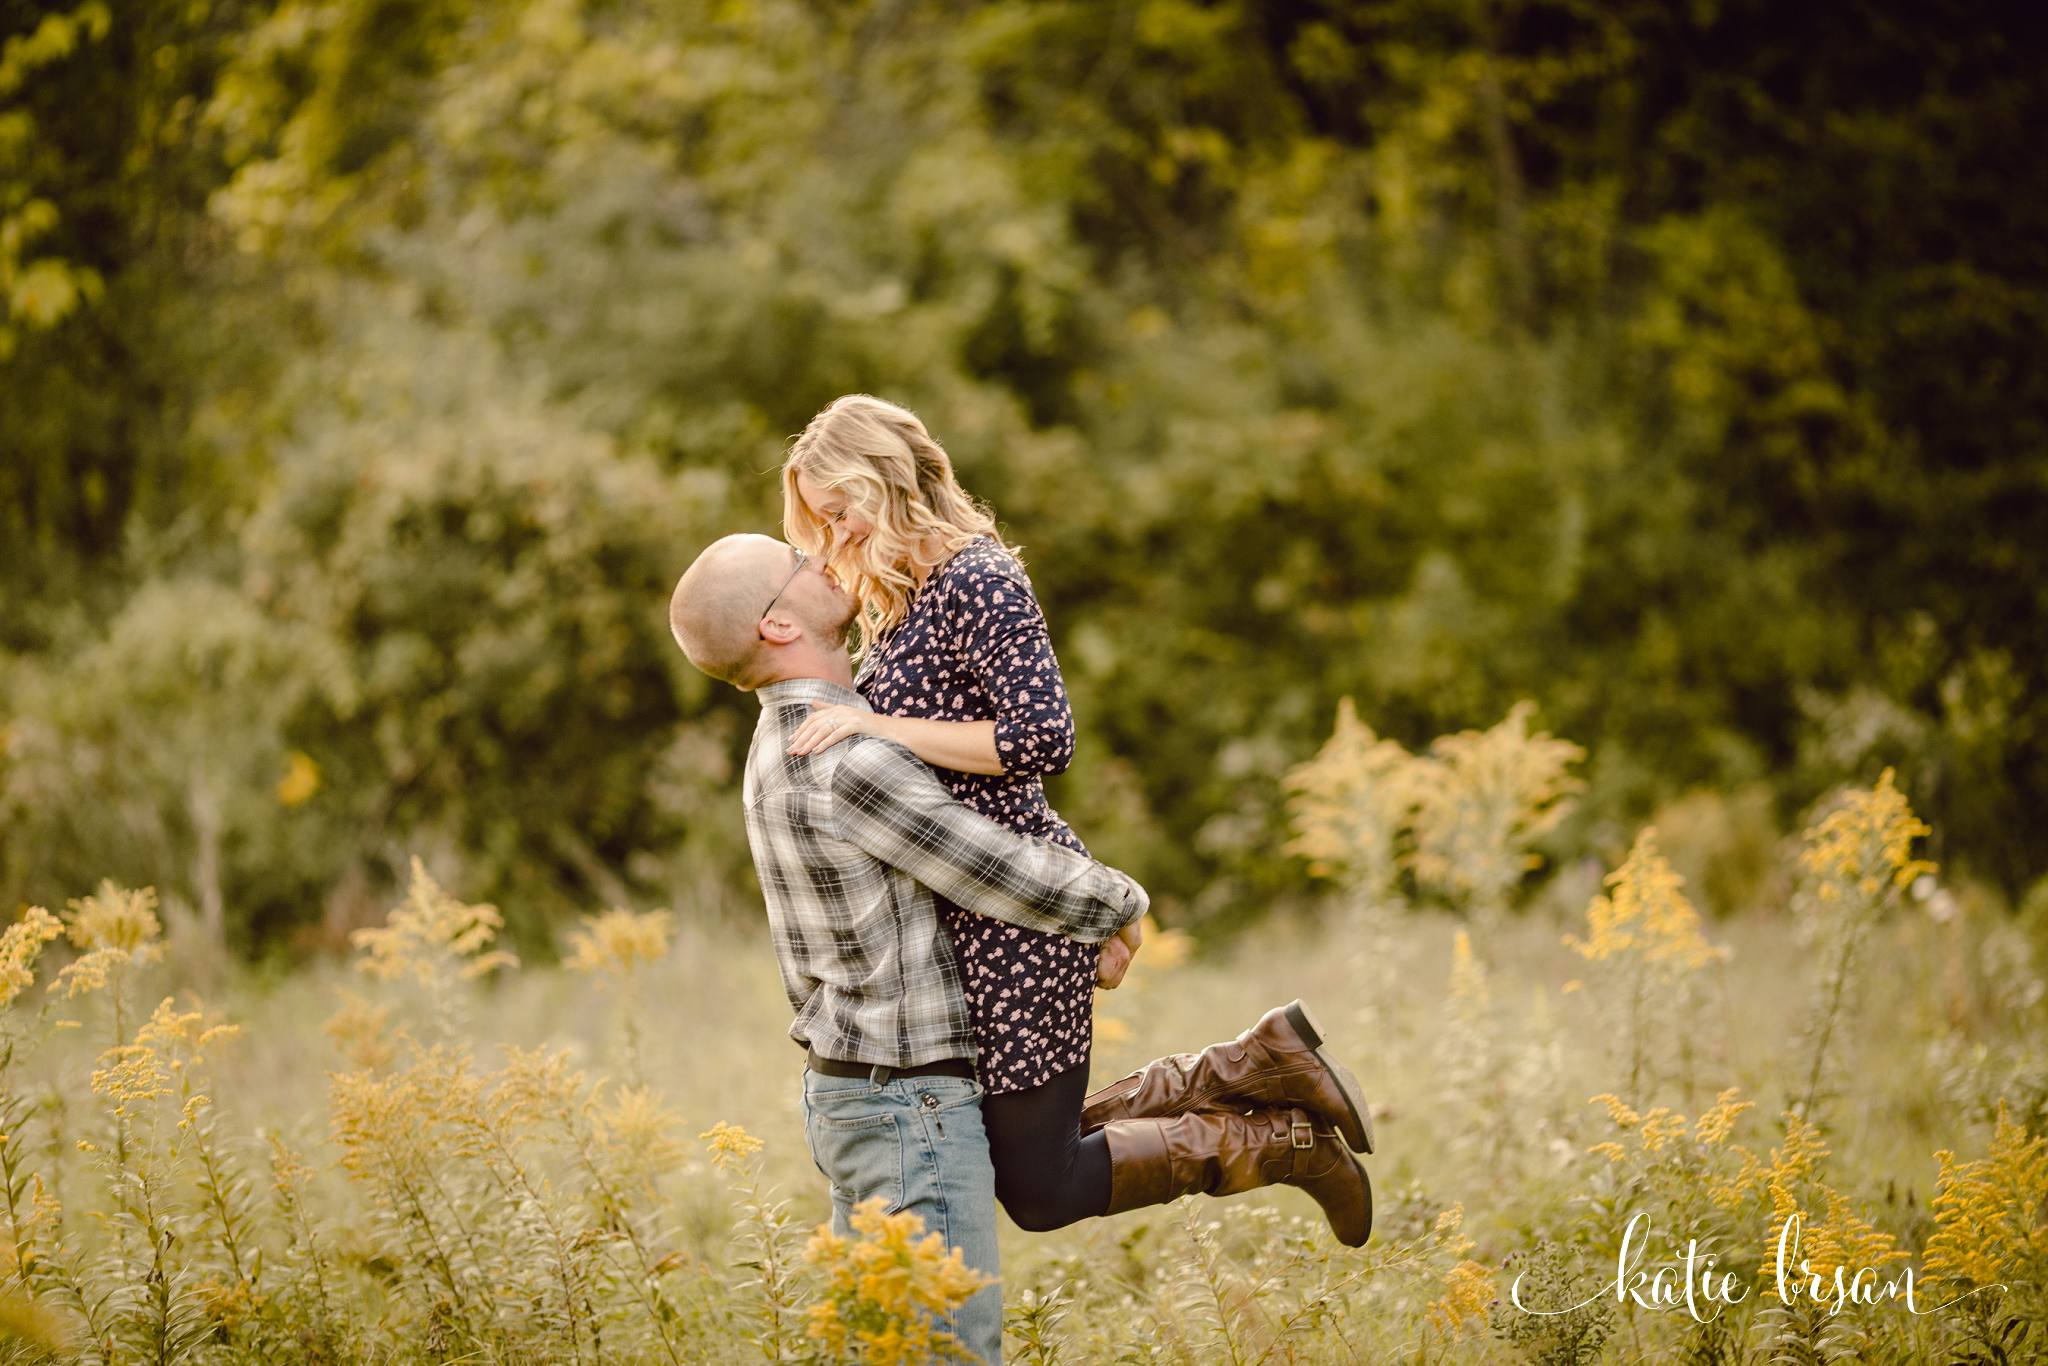 KatieBrsan-Frankfort-EngagementPhotos_0503.jpg